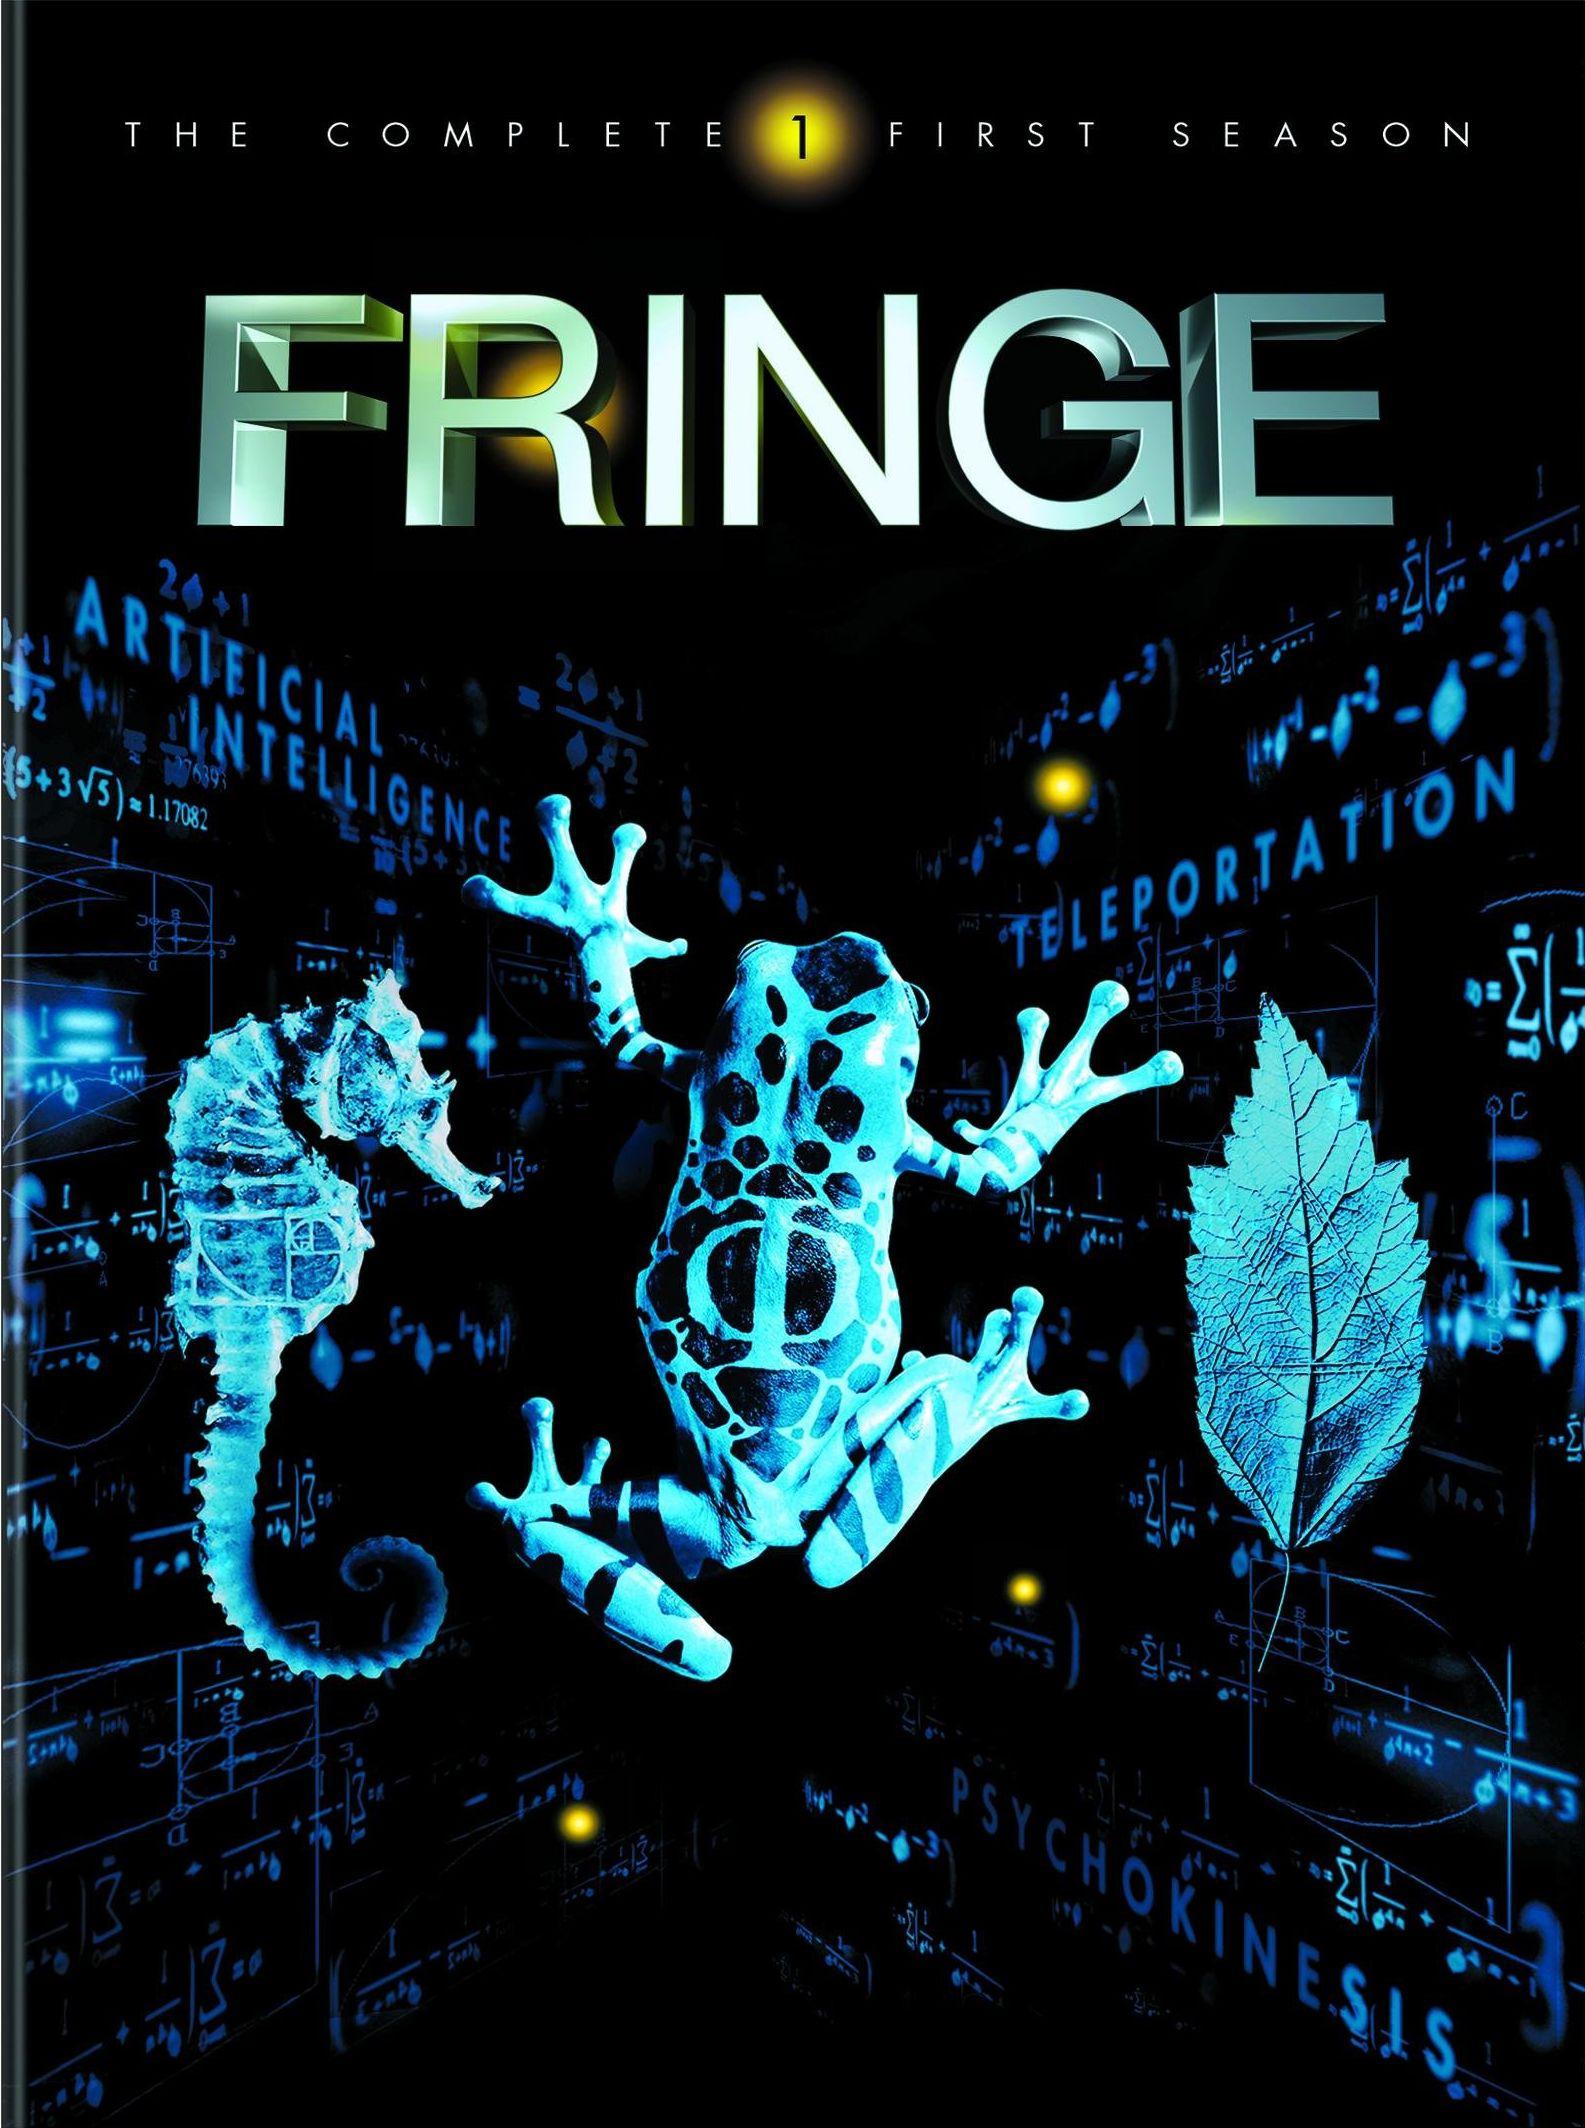 Fringe Season 1 2008 2009 The Sporadic Chronicles